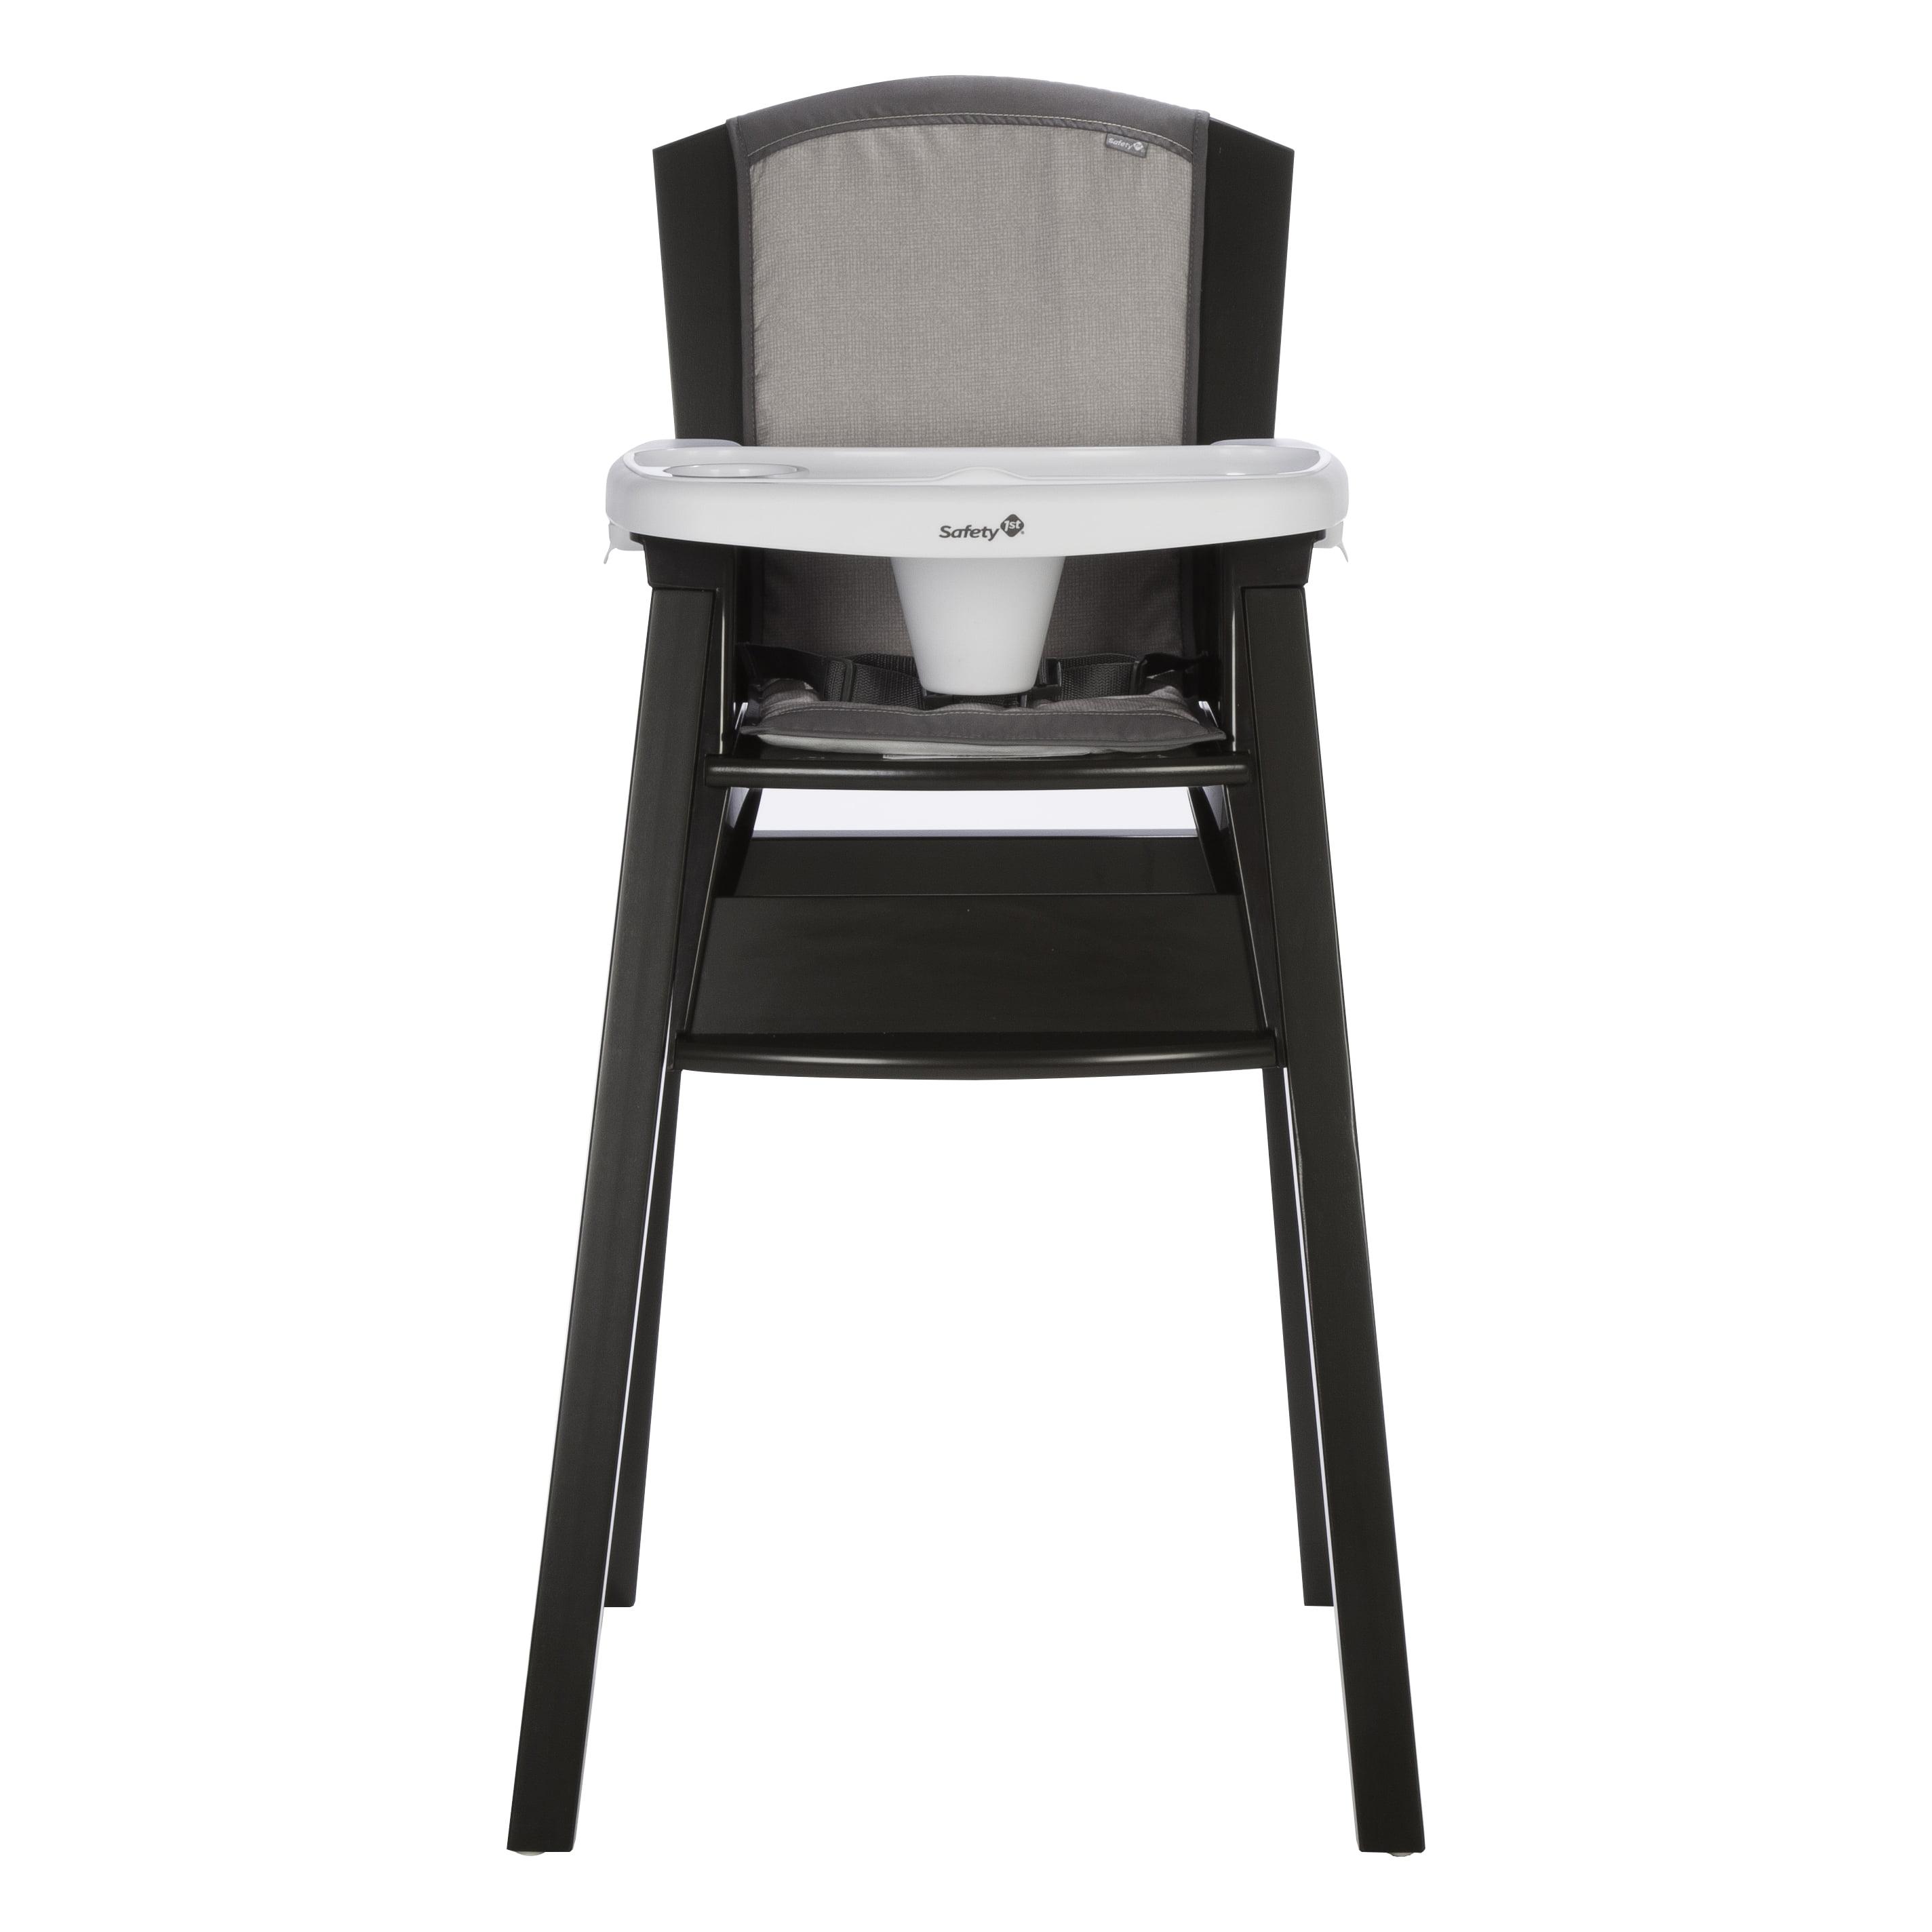 Safety 1st Wood High Chair, Beaumont   Walmart.com